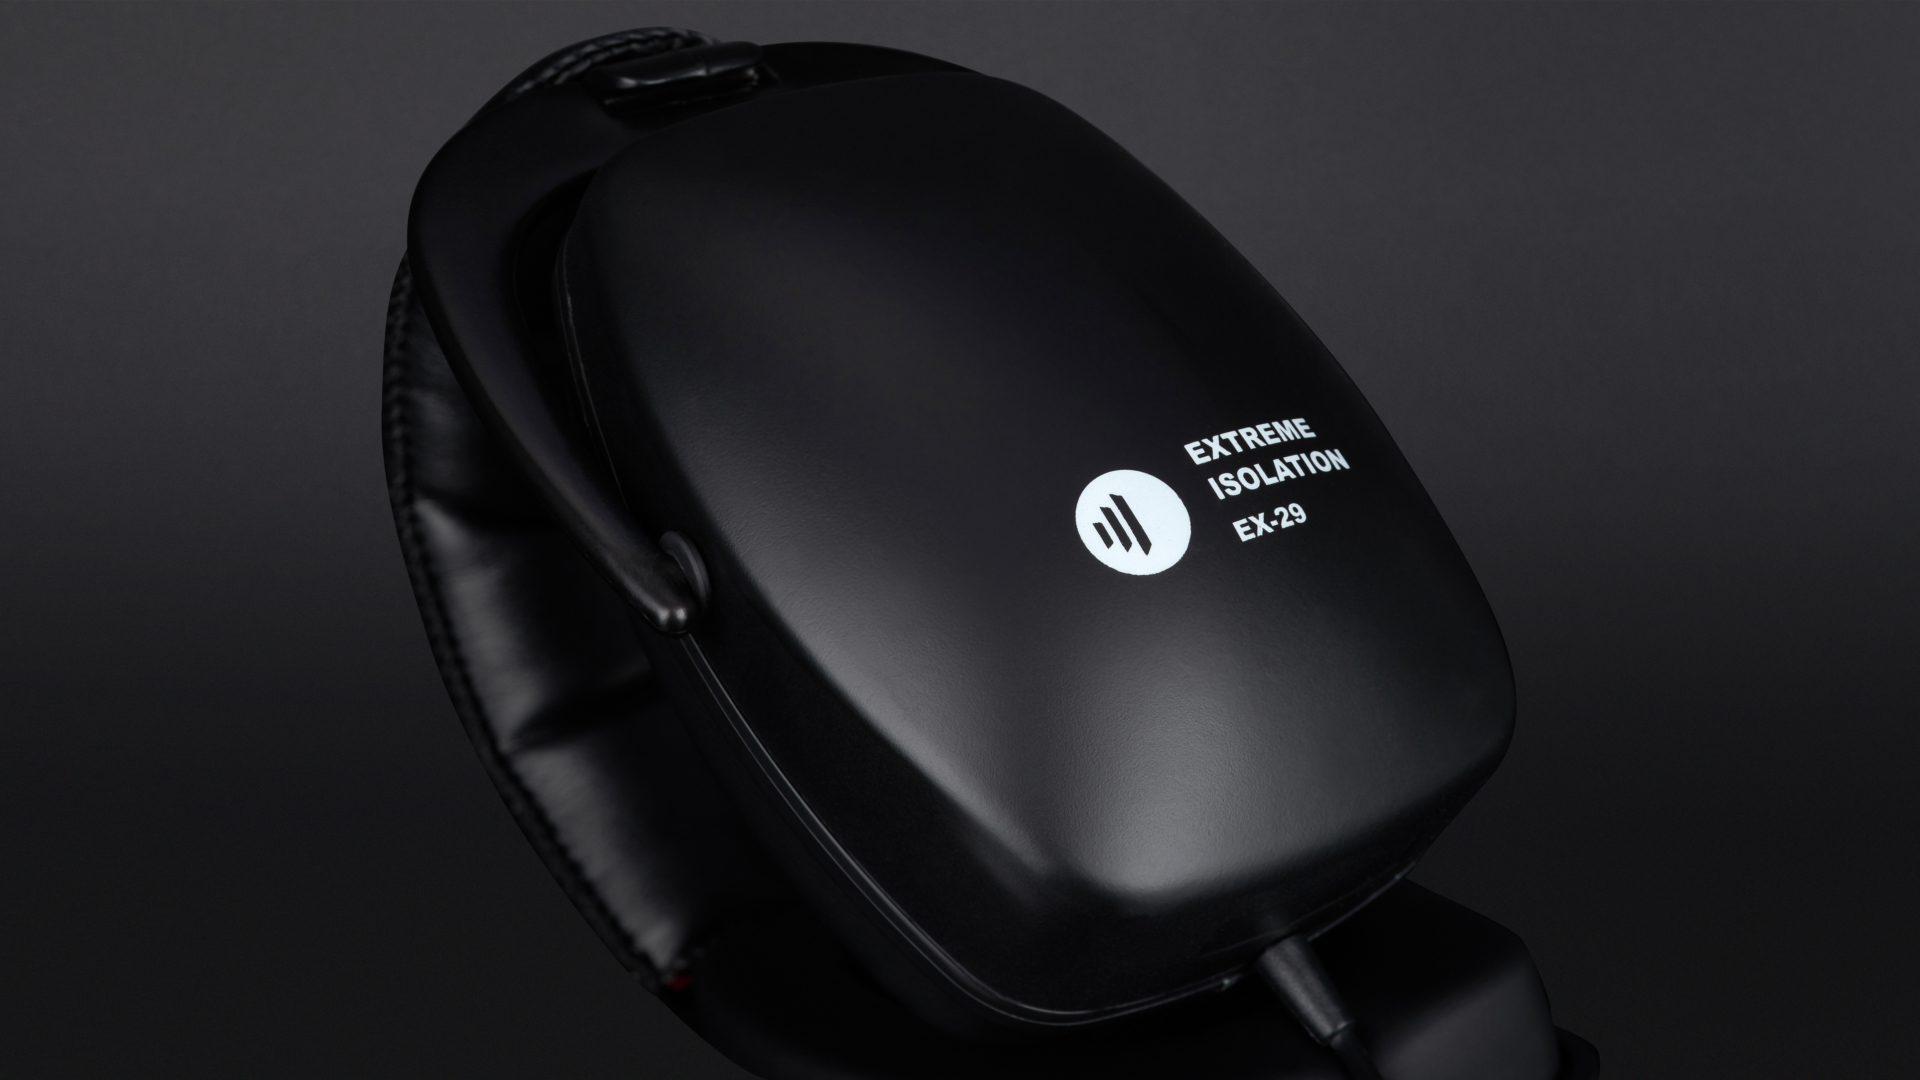 Direct Sound Extreme Isolation EX-29